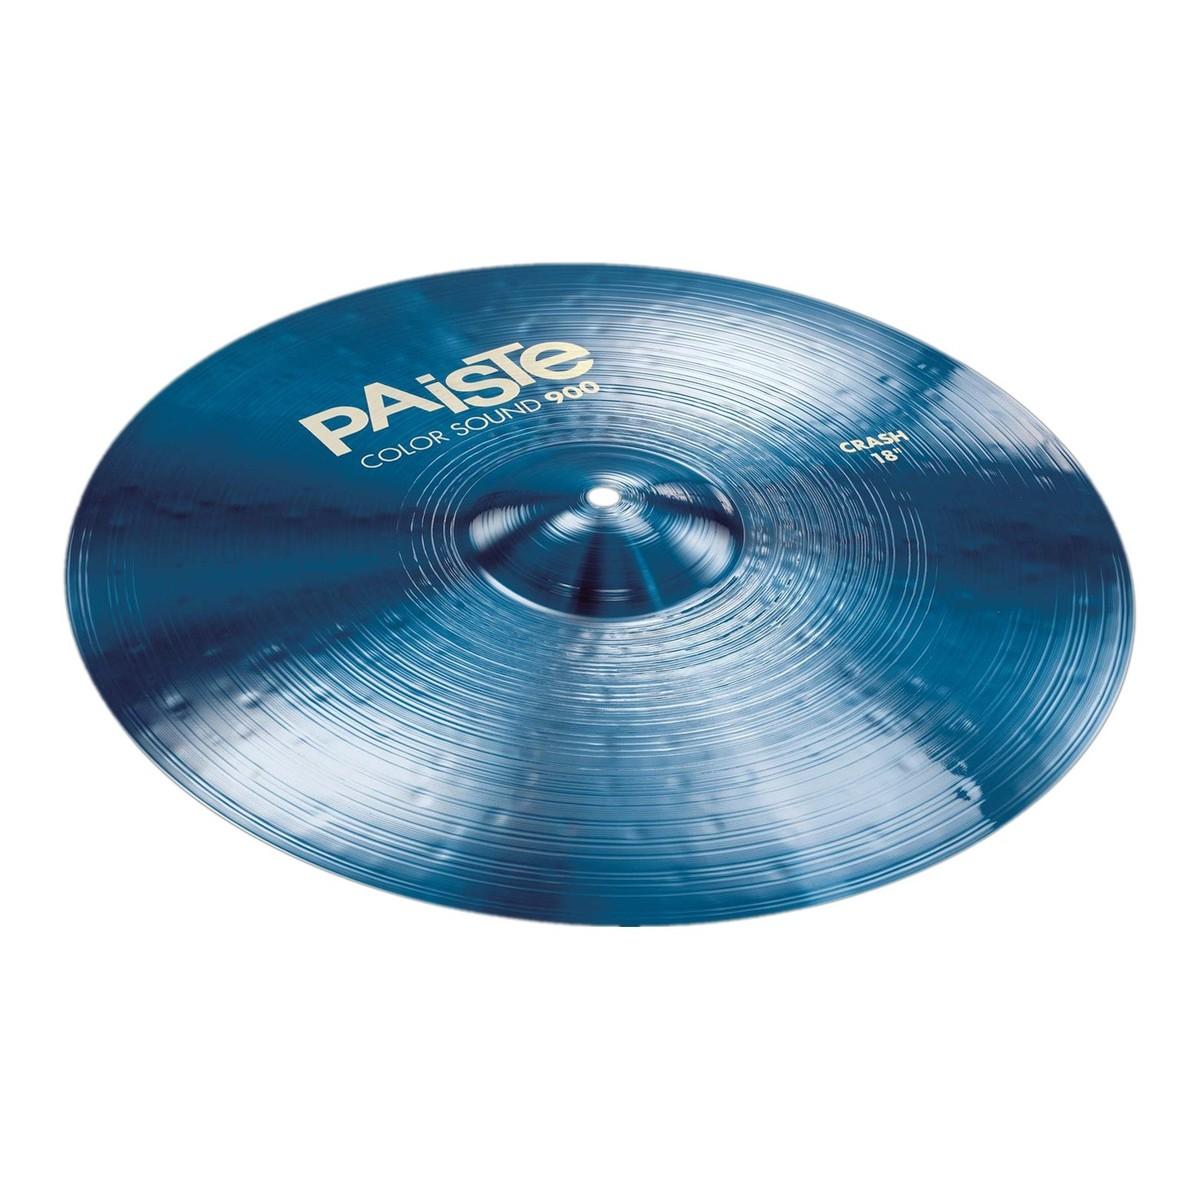 paiste color sound 900 blue 18 39 39 crash cymbal at gear4music. Black Bedroom Furniture Sets. Home Design Ideas